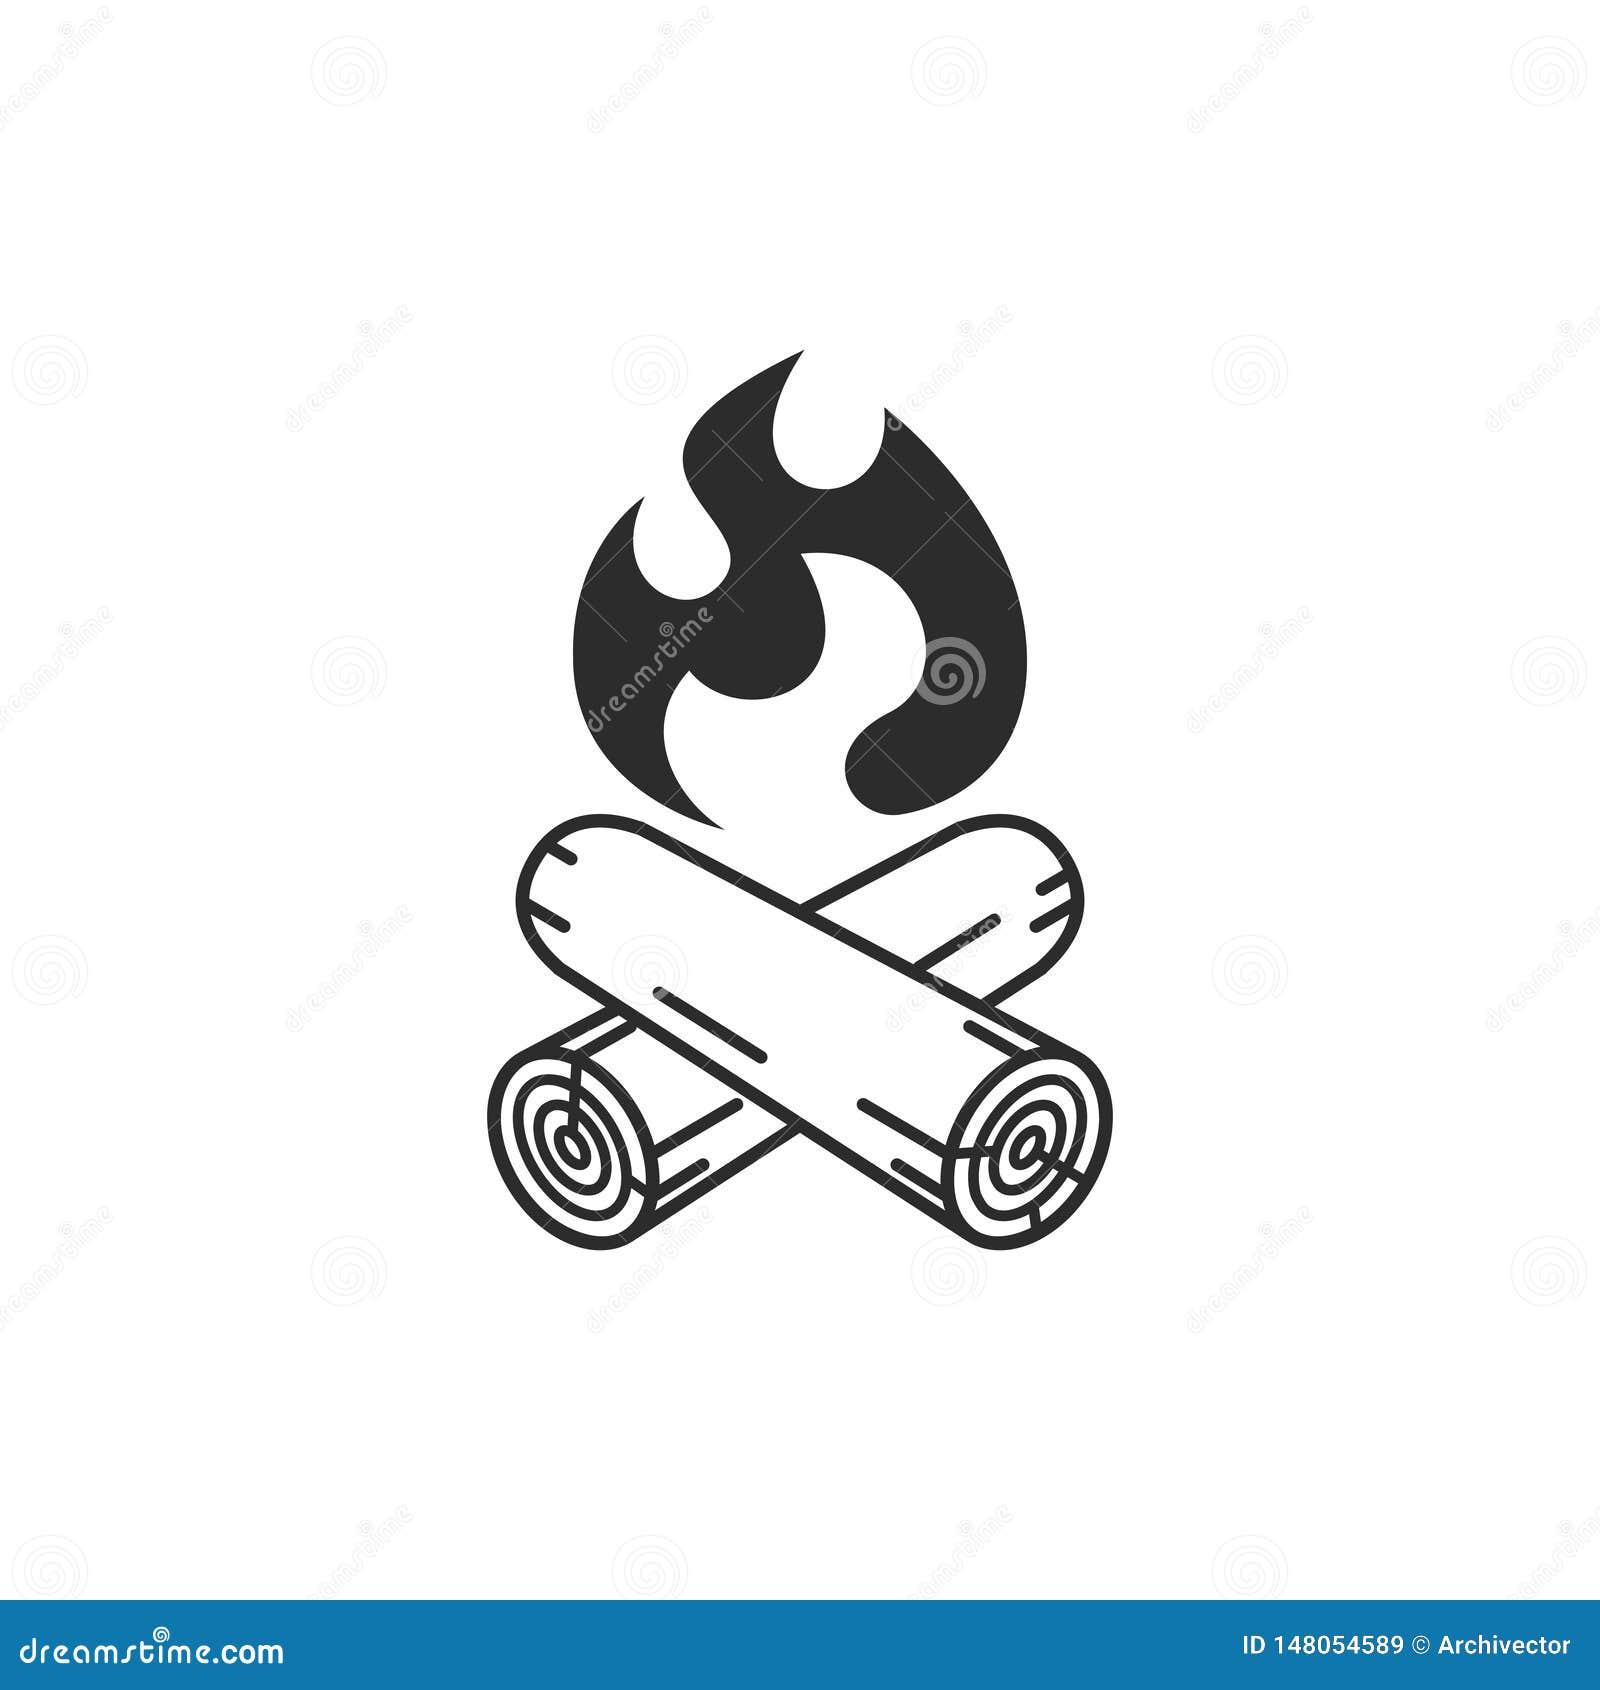 Campfire graphic icon. Camping symbol